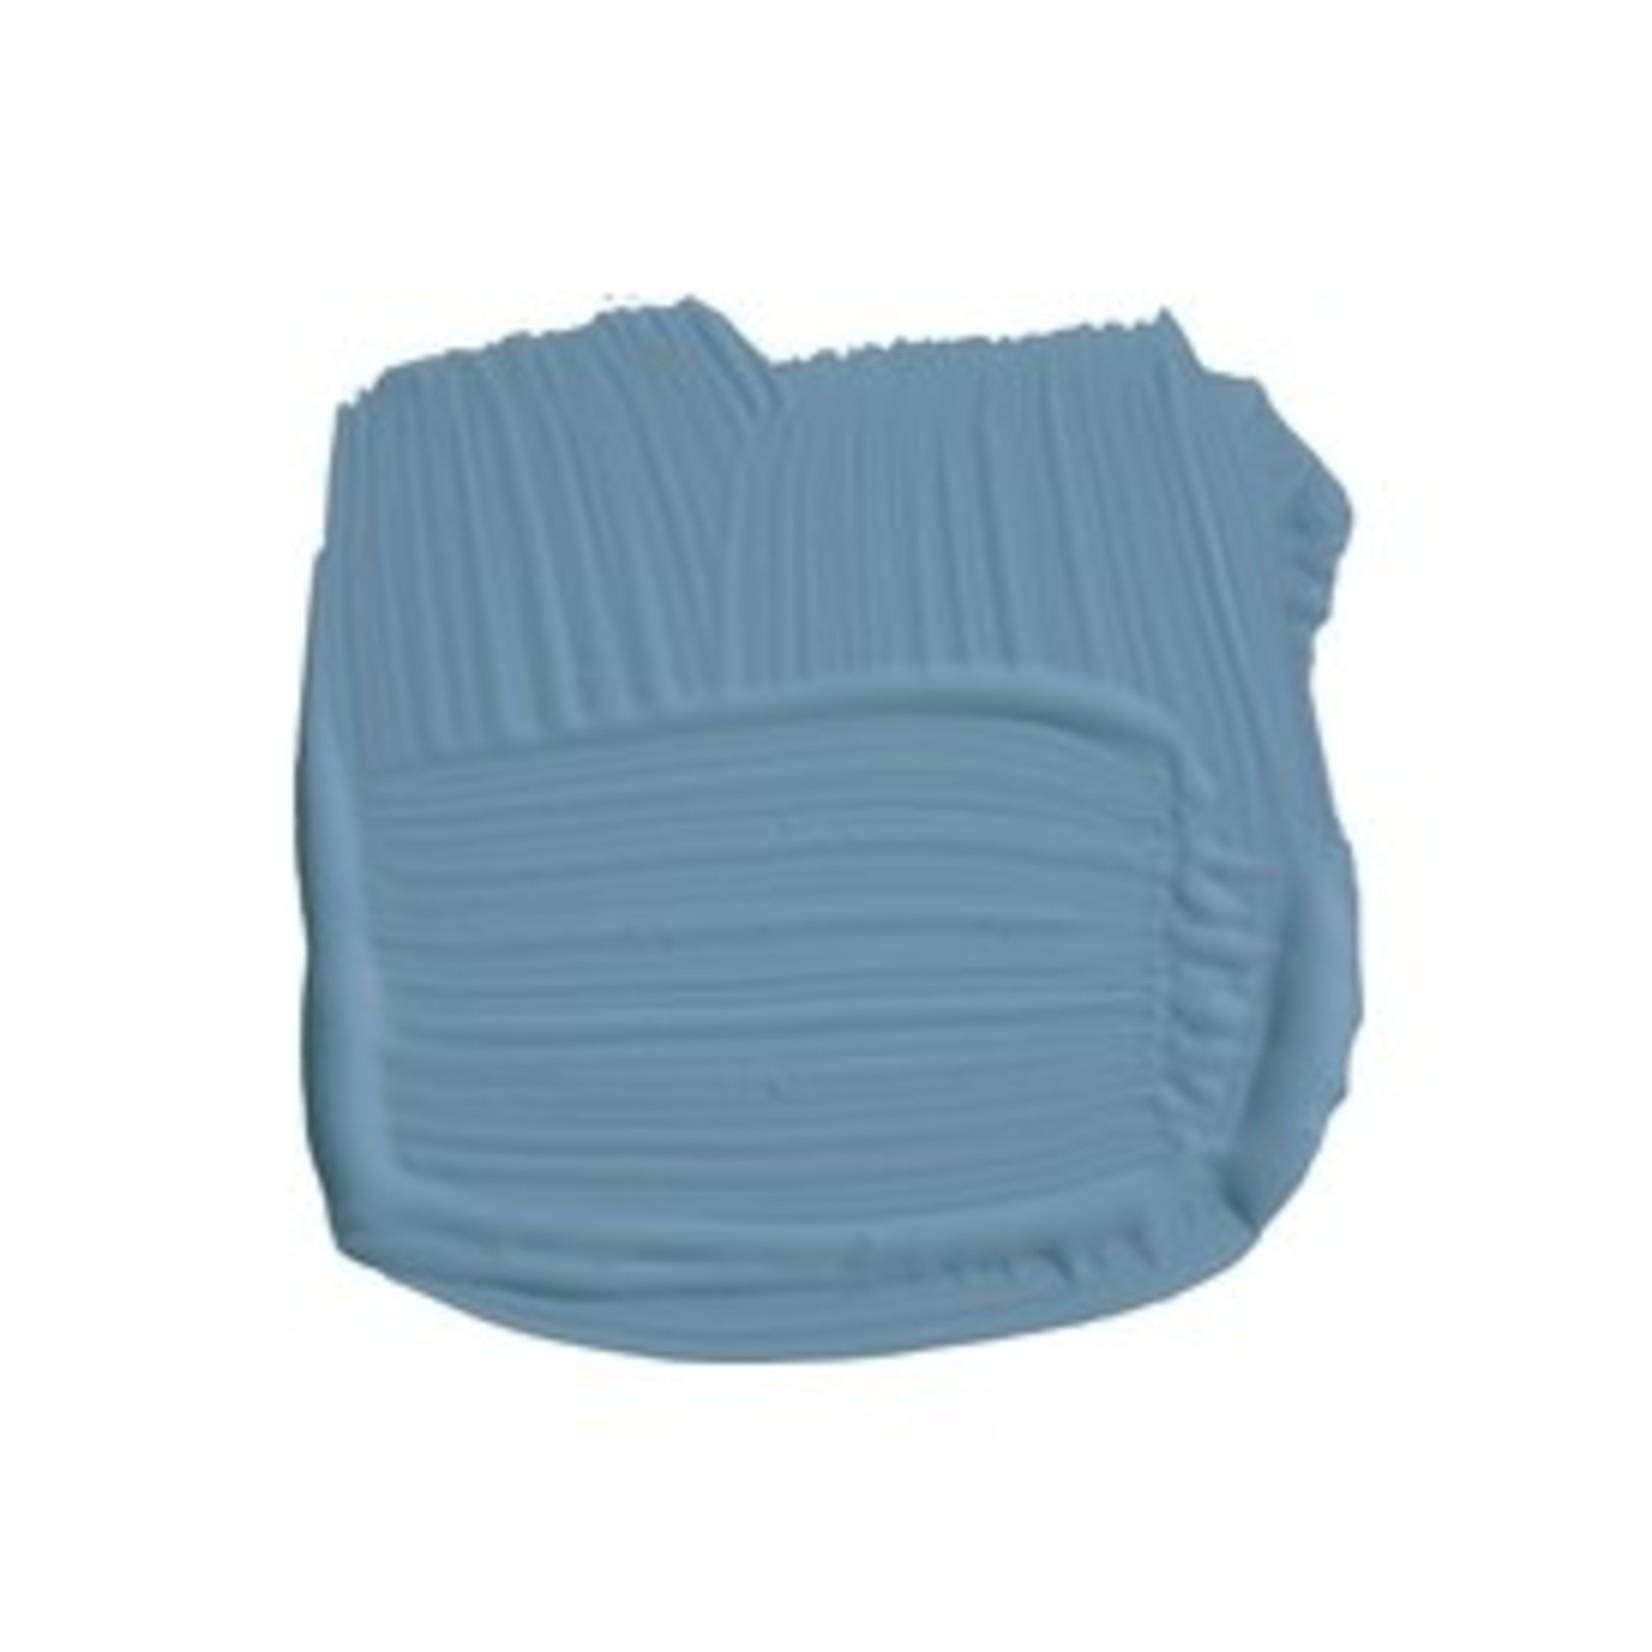 FARROW & BALL ULTRA MARINE BLUE - No. W29